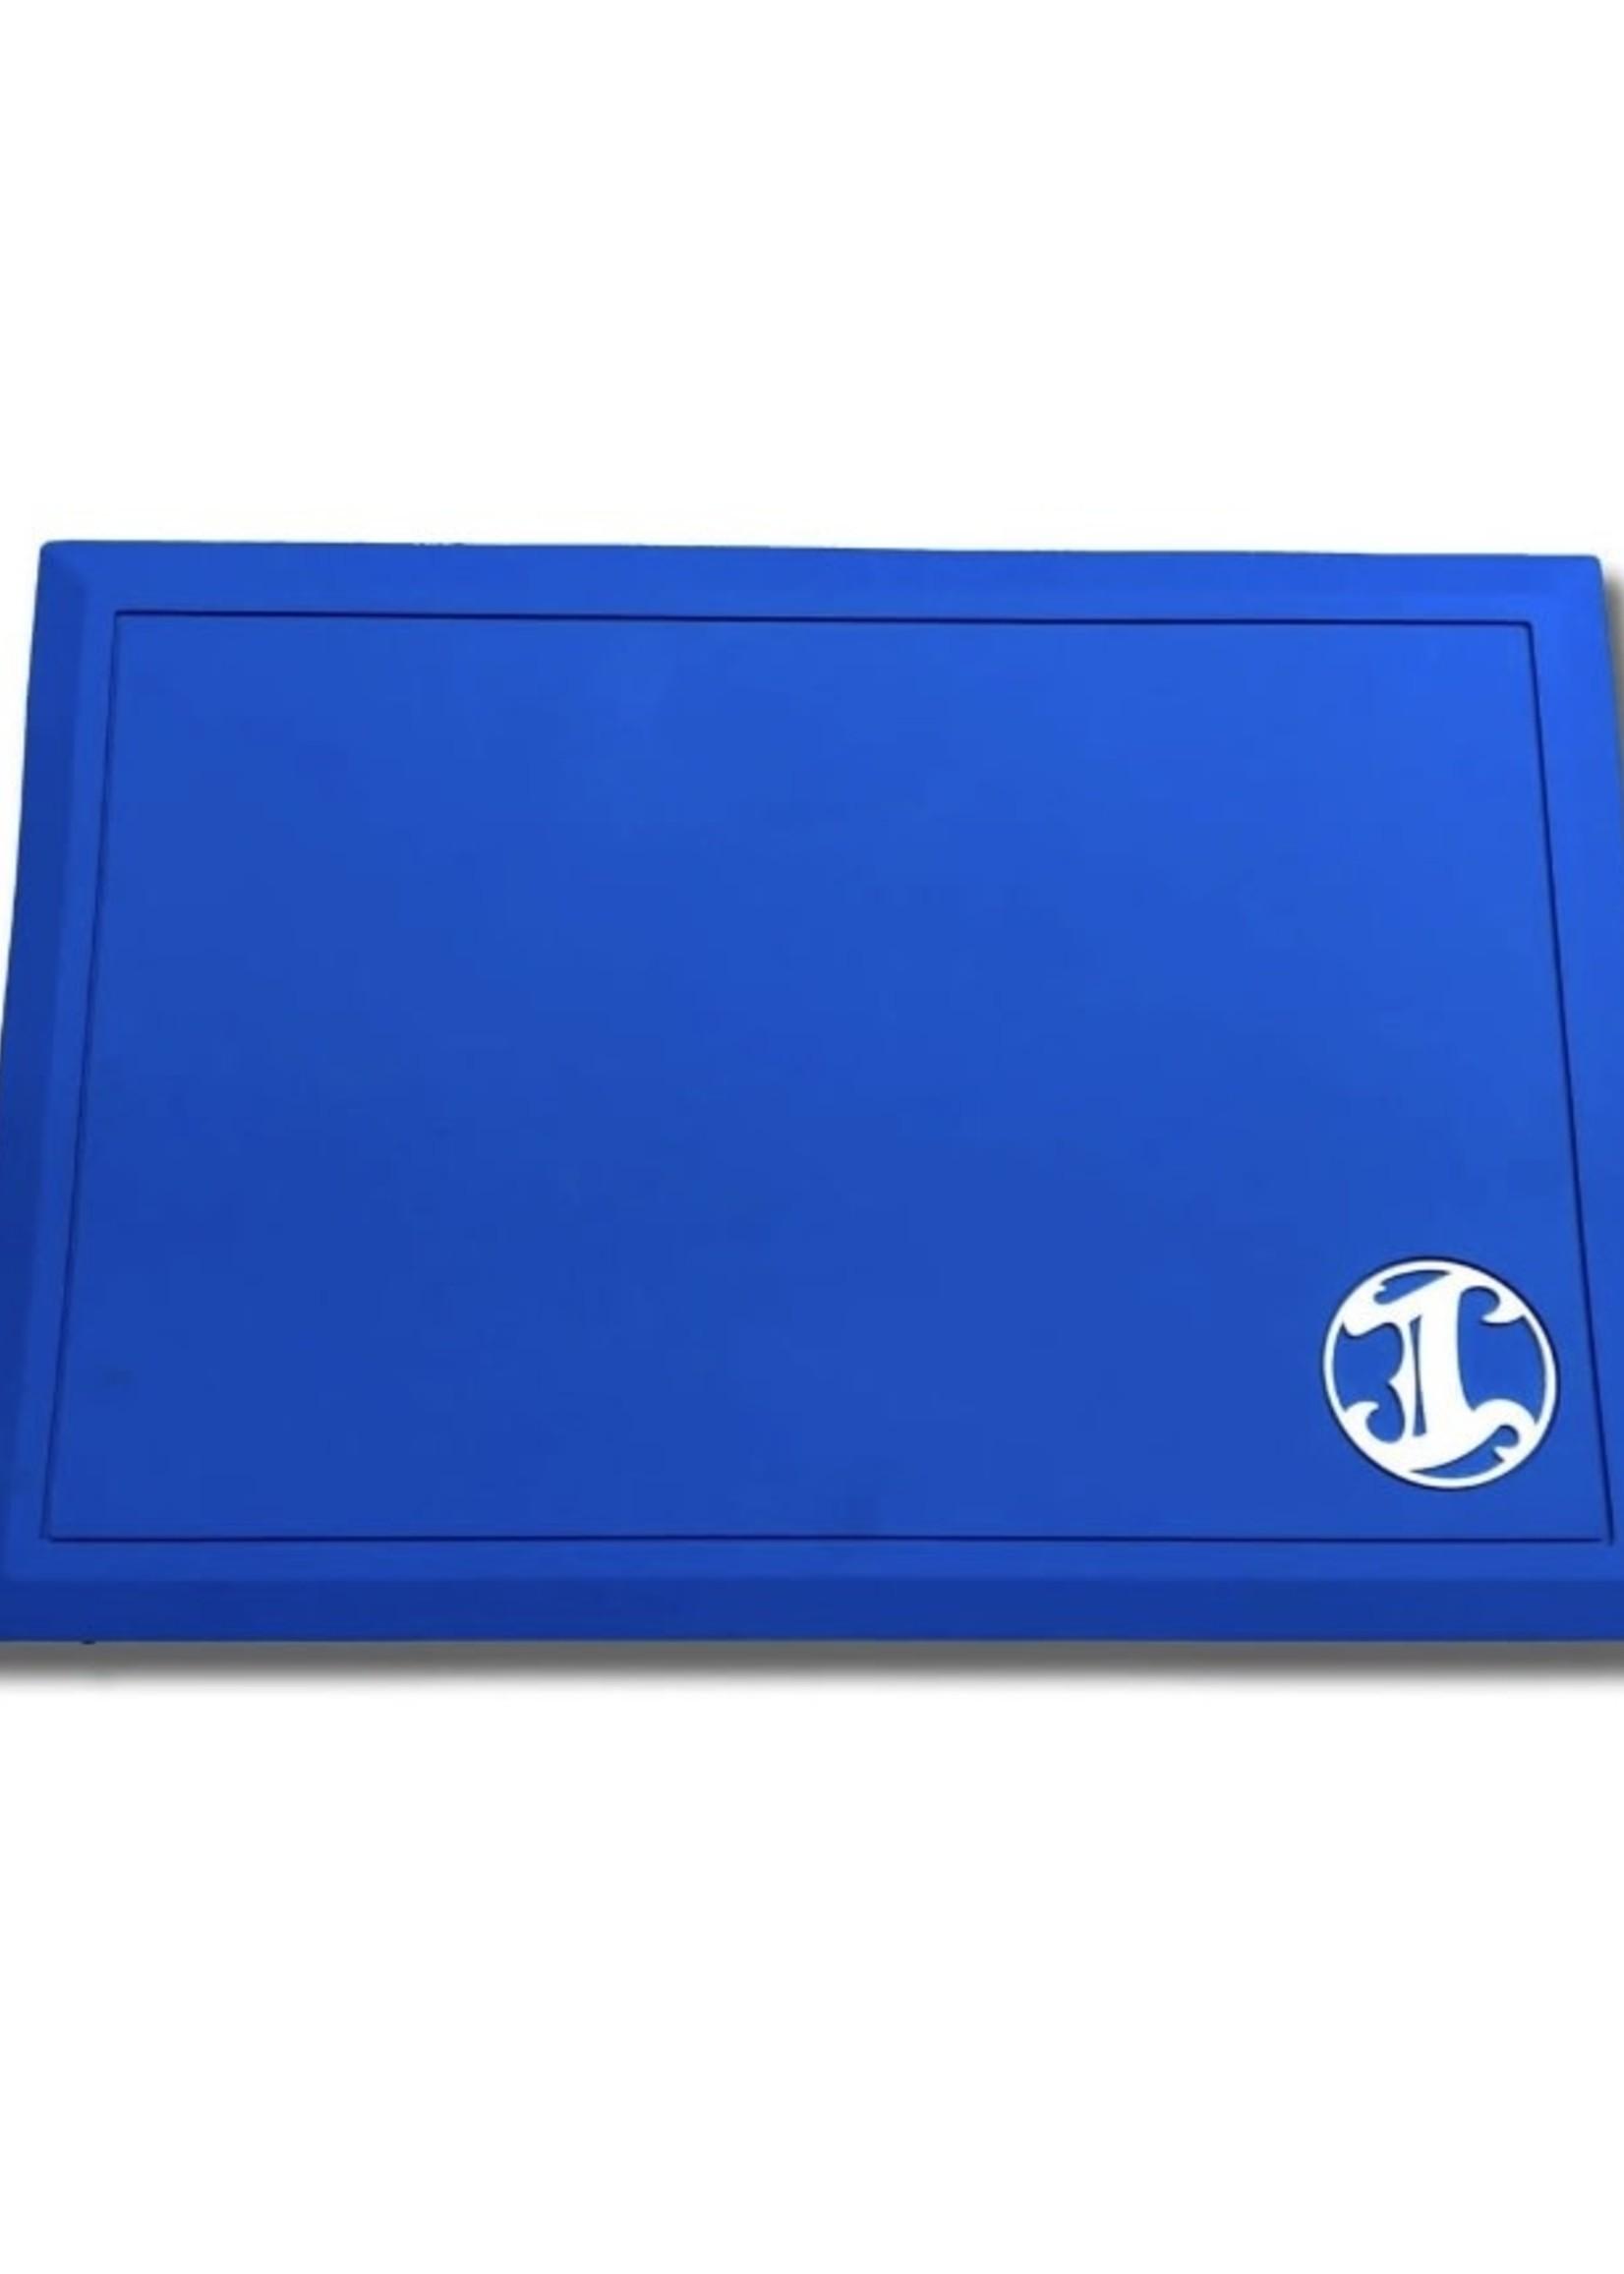 Irving Barber Co Irving Workstation Mat- Blue w/ White Logo